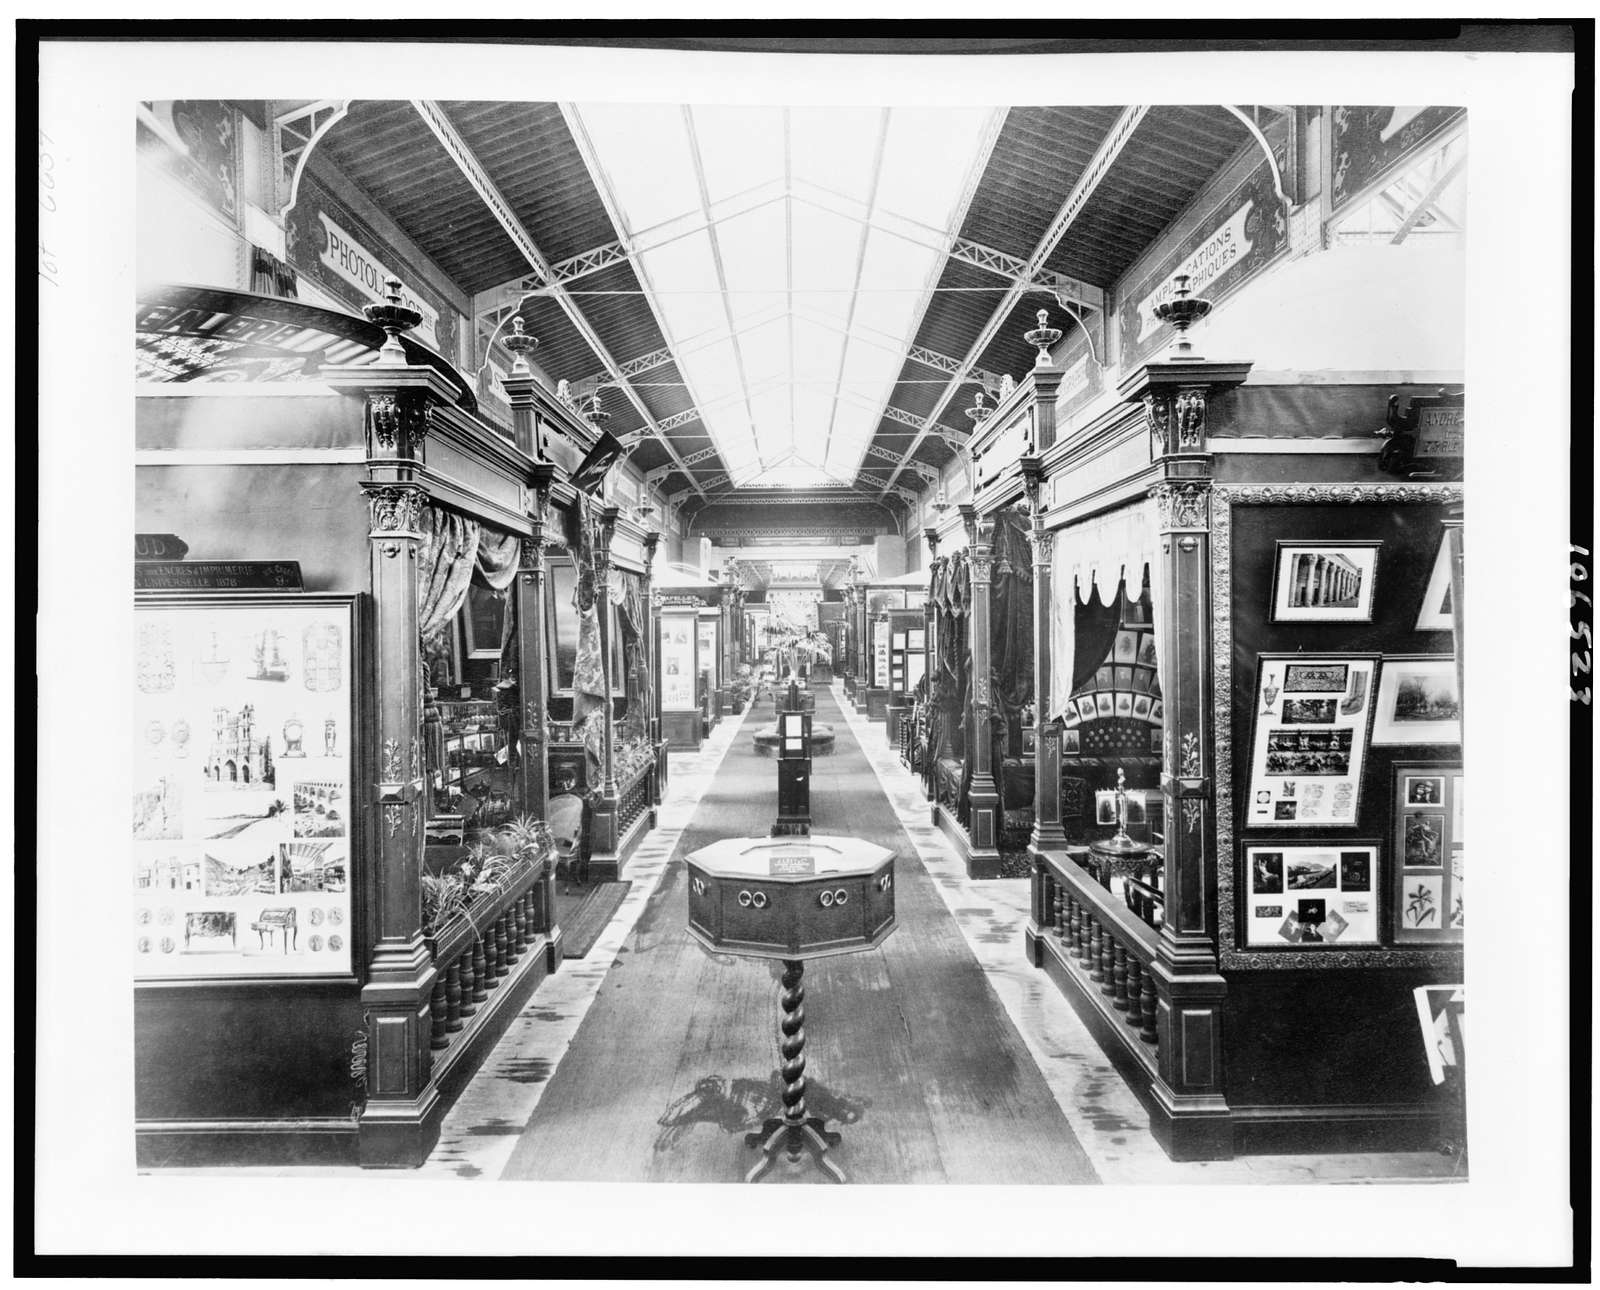 [Photography exhibit, Palace of Liberal Arts, Paris Exposition, 1889]